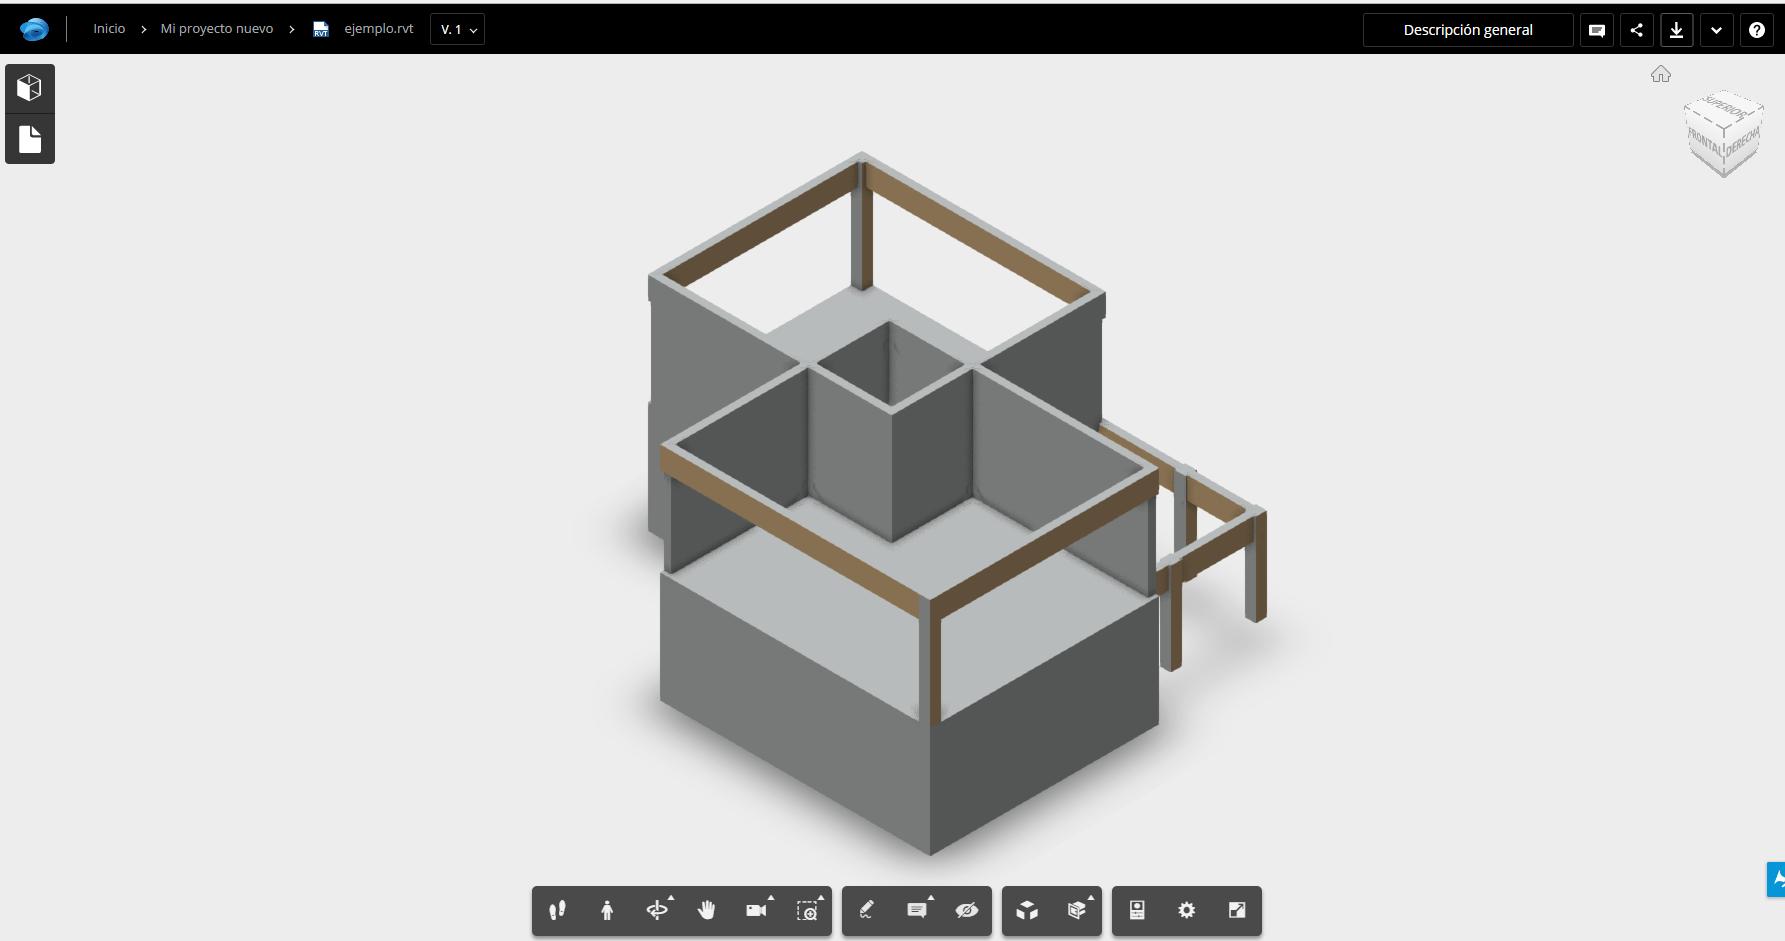 71d6dee330f7 Cómo visualizar un modelo Revit en una tablet o celular - MundoBIM